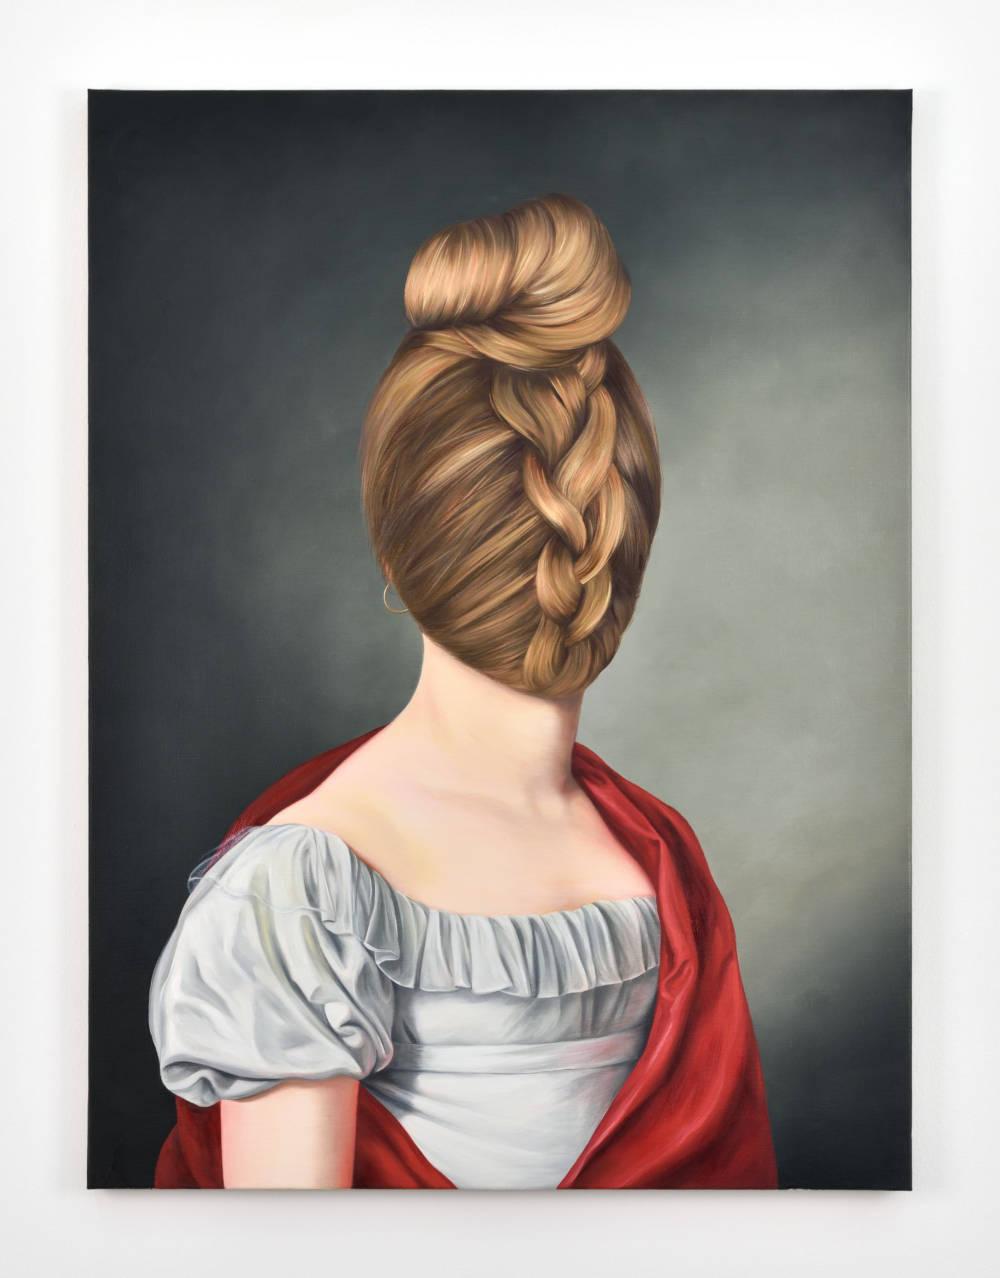 Untitled (after Christoffer Eckersberg)